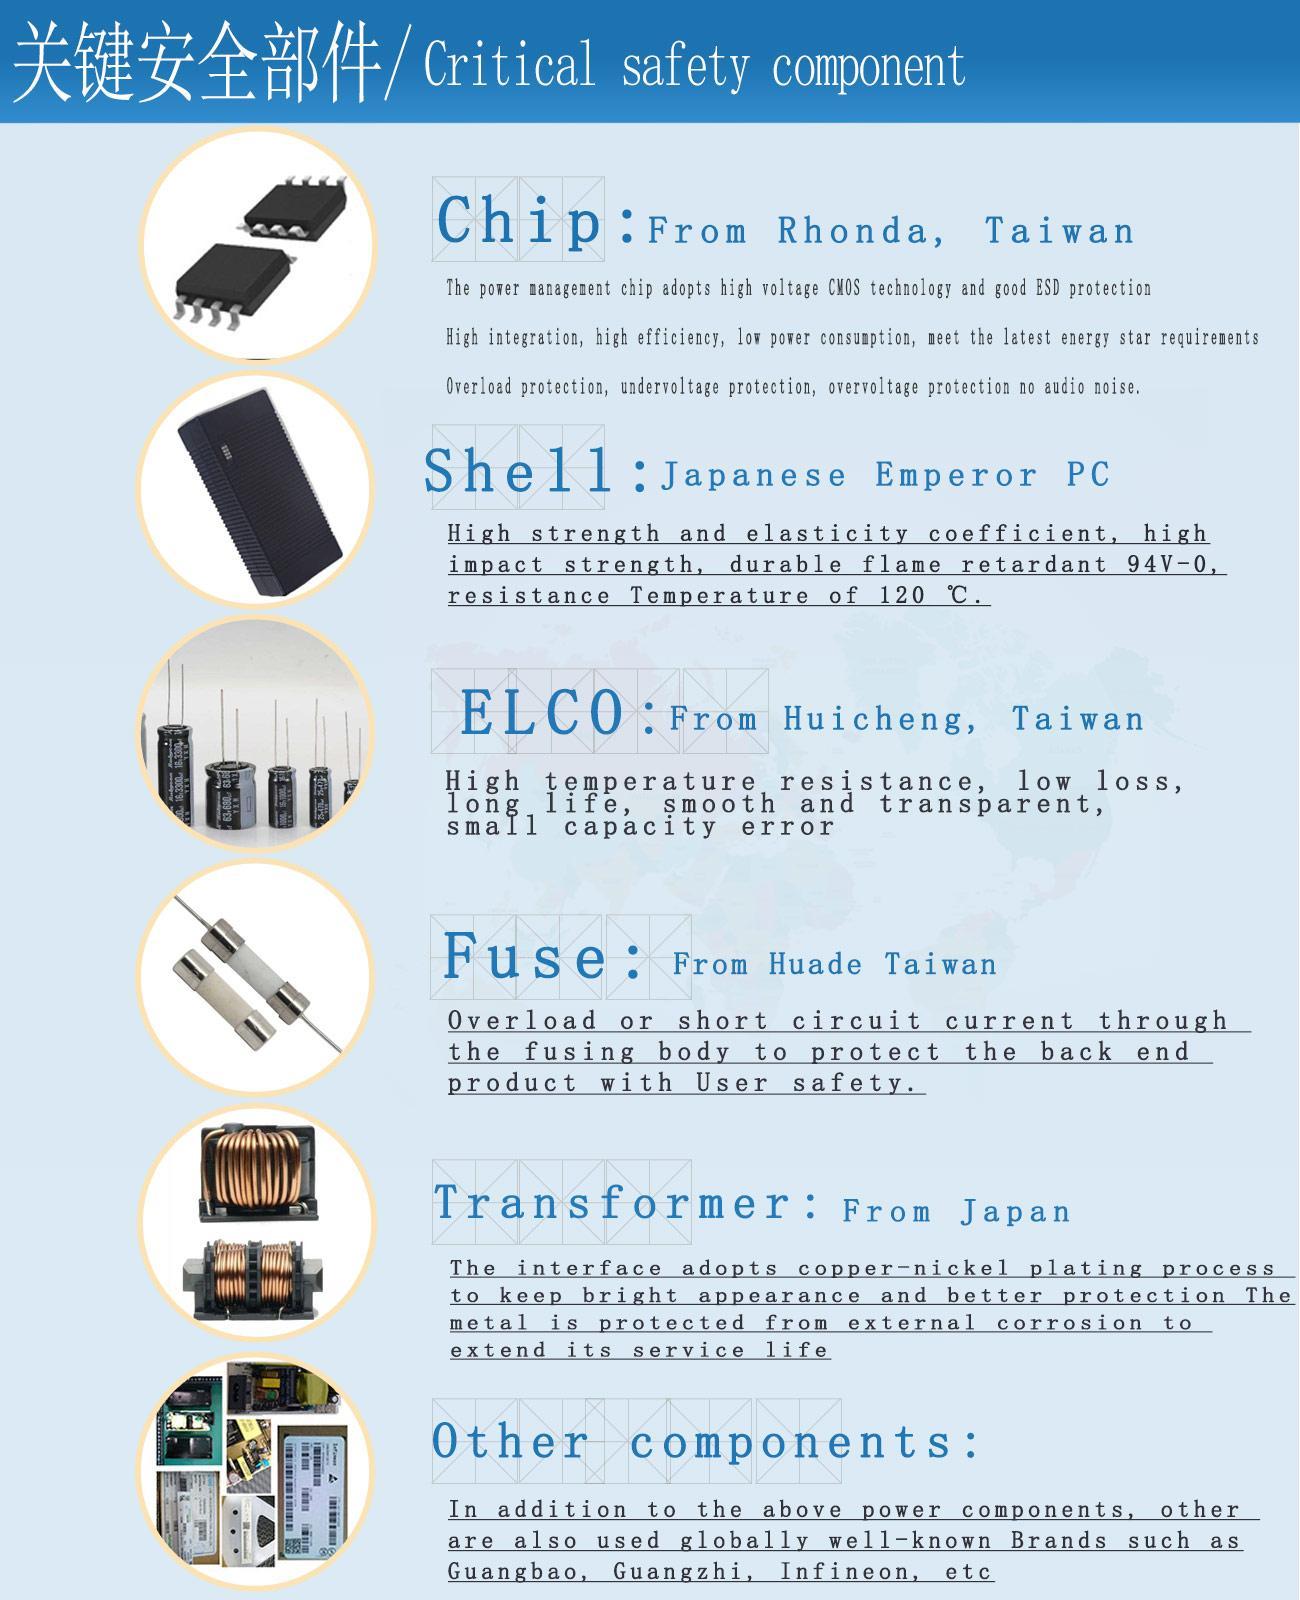 UL60950-1認証37.8V2A鋰電池充電器 9串鋰電池組充電器 5